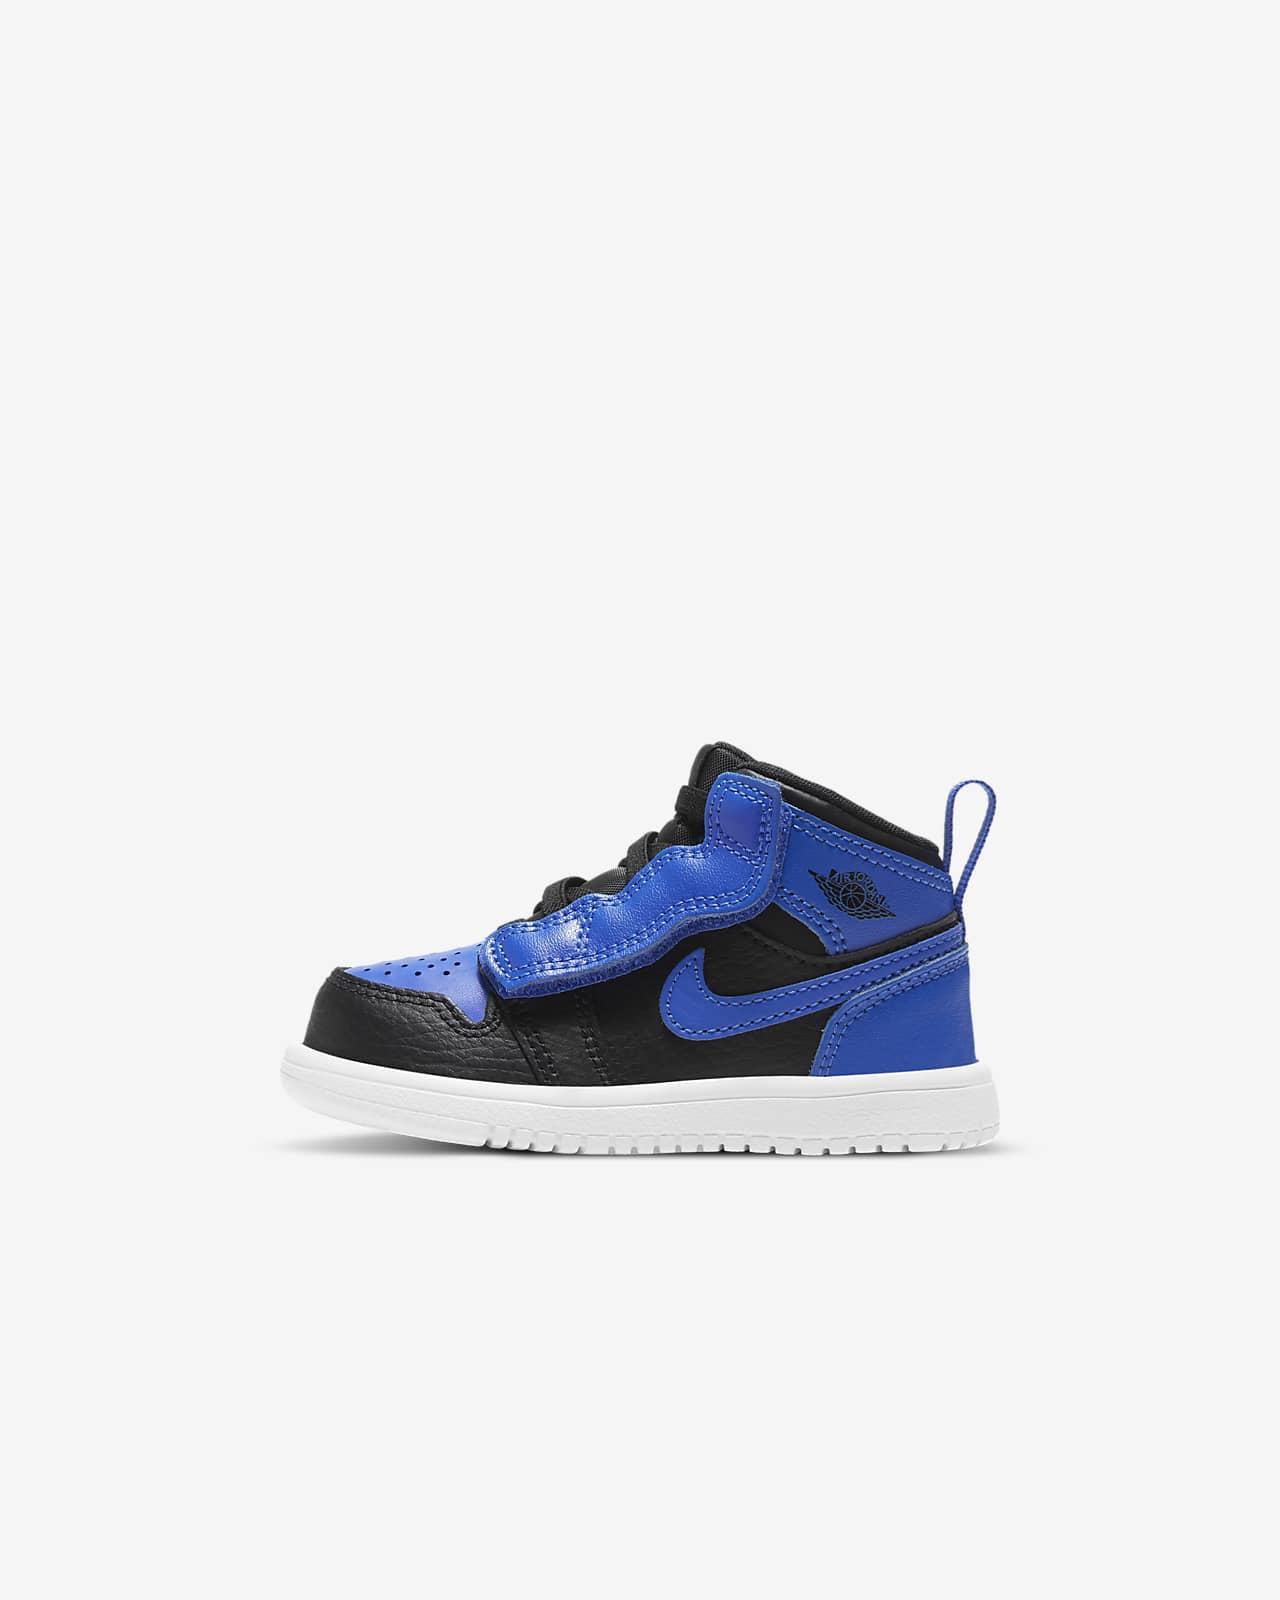 Jordan 1 Mid Alt (TD) 婴童运动童鞋